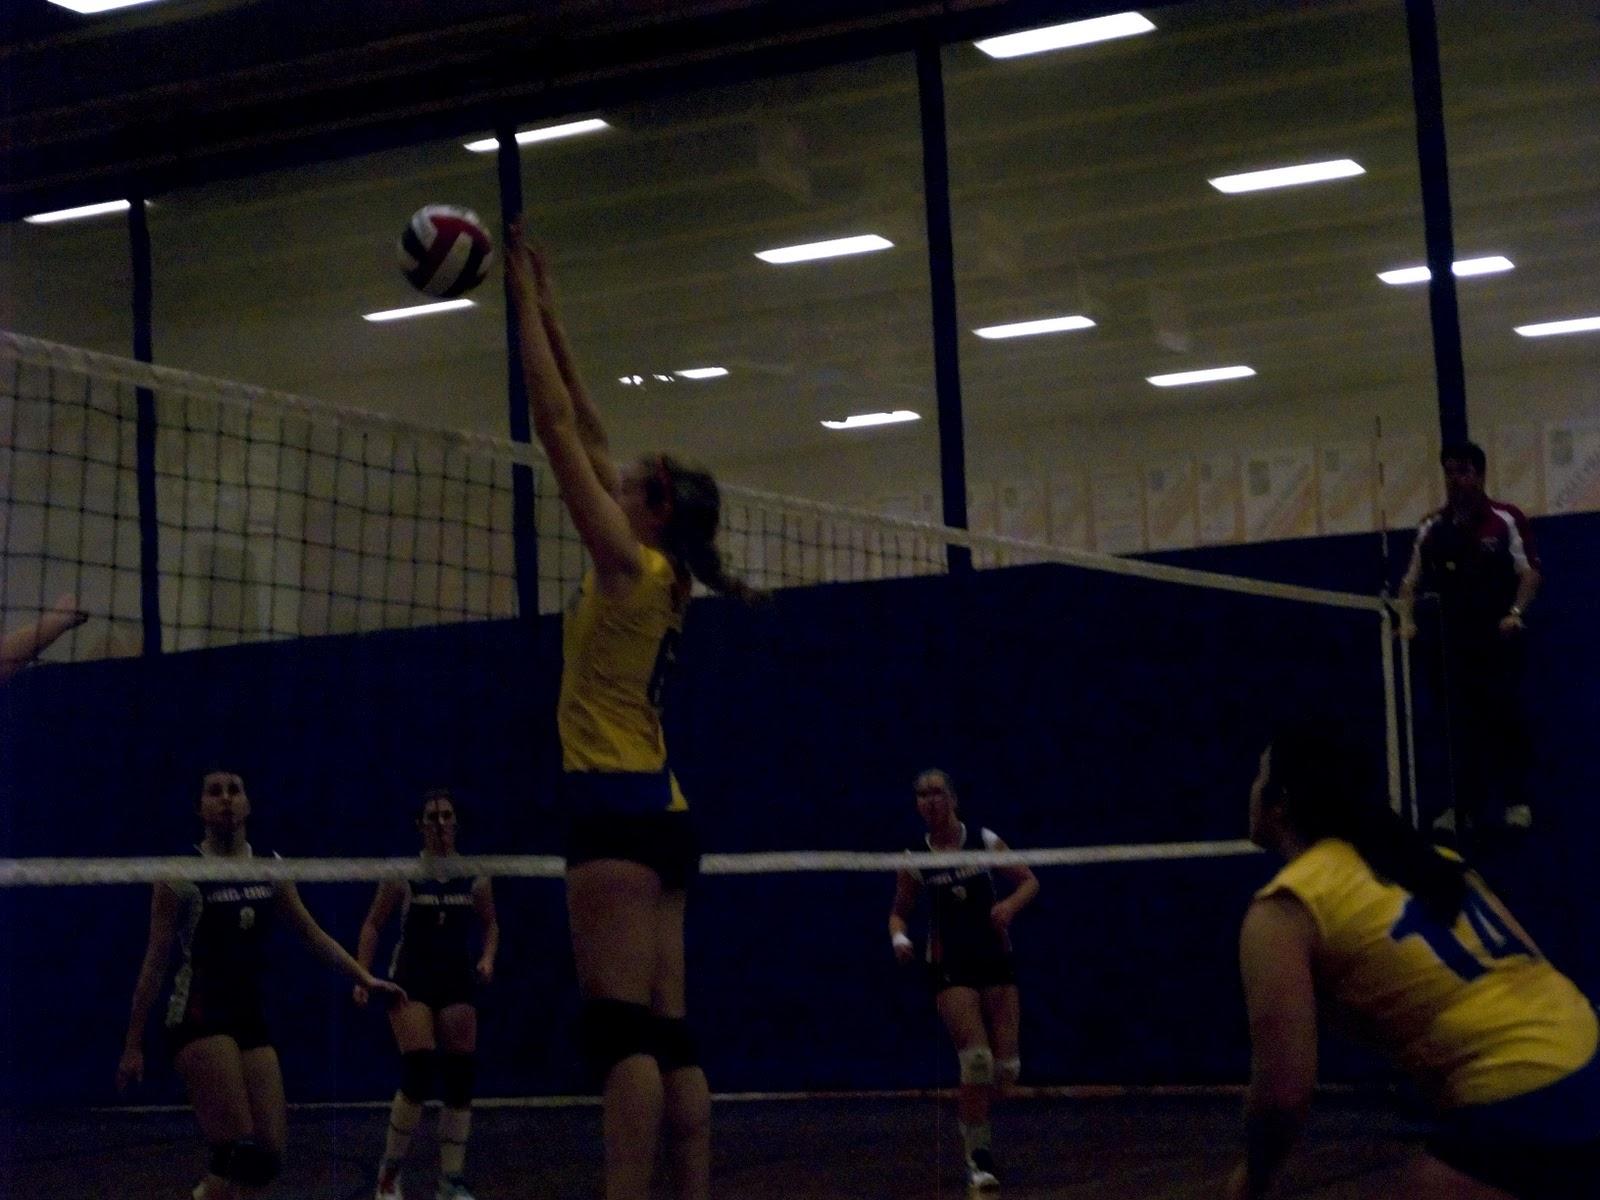 resultat tqo volley